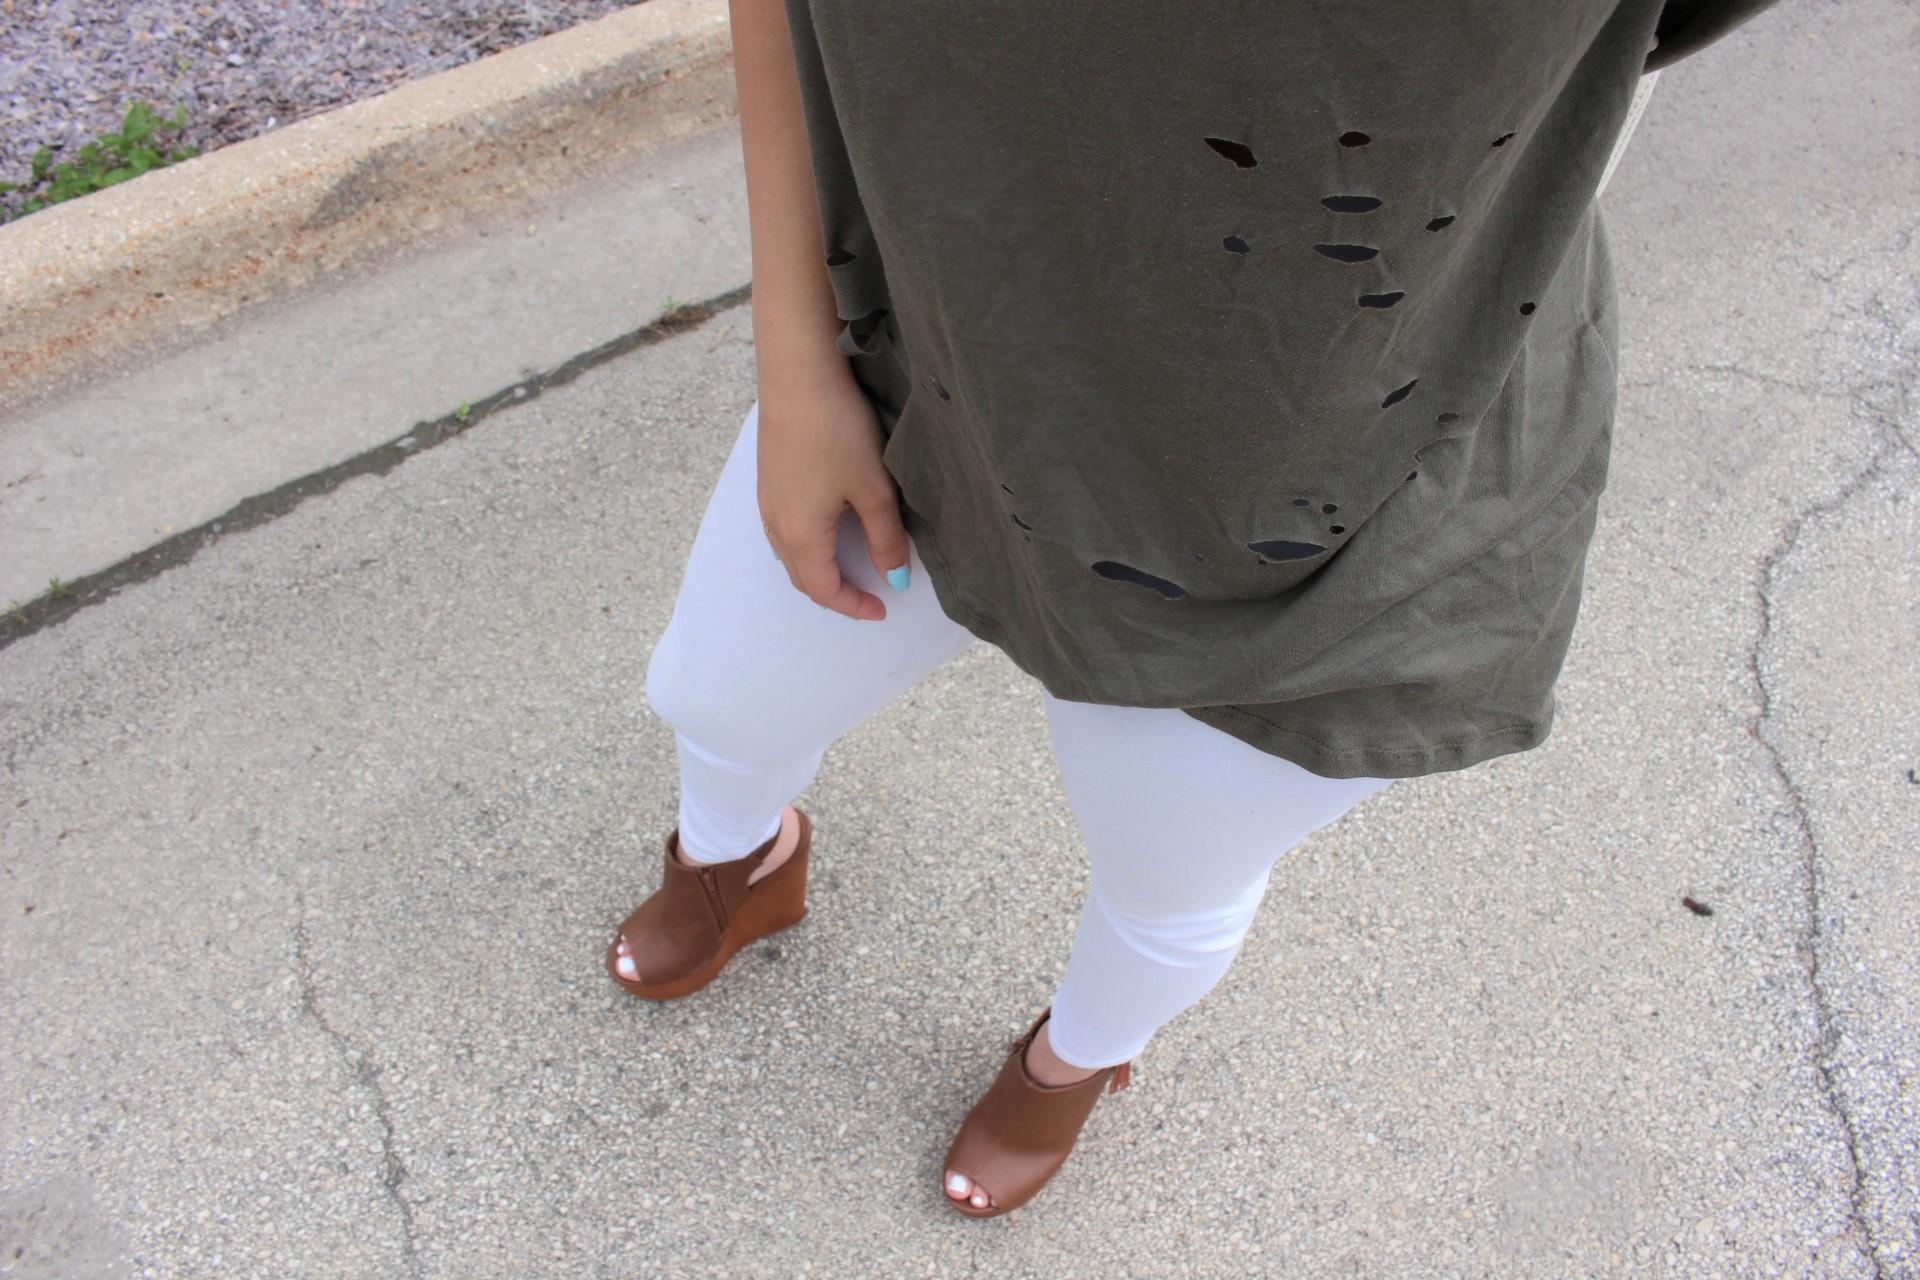 Tobi verde militar clothing summer shoes details by Alejandra Avila Tu fashion petite (2)